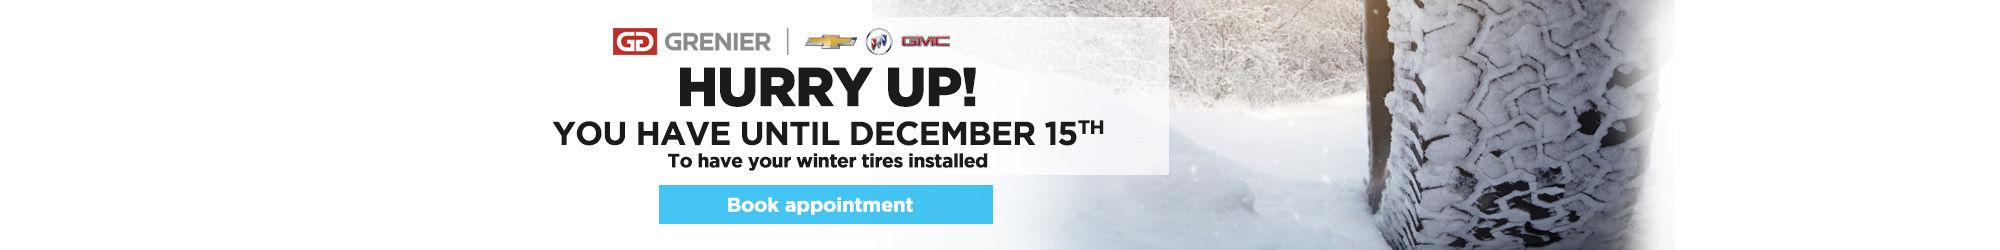 service winter tires december 15th